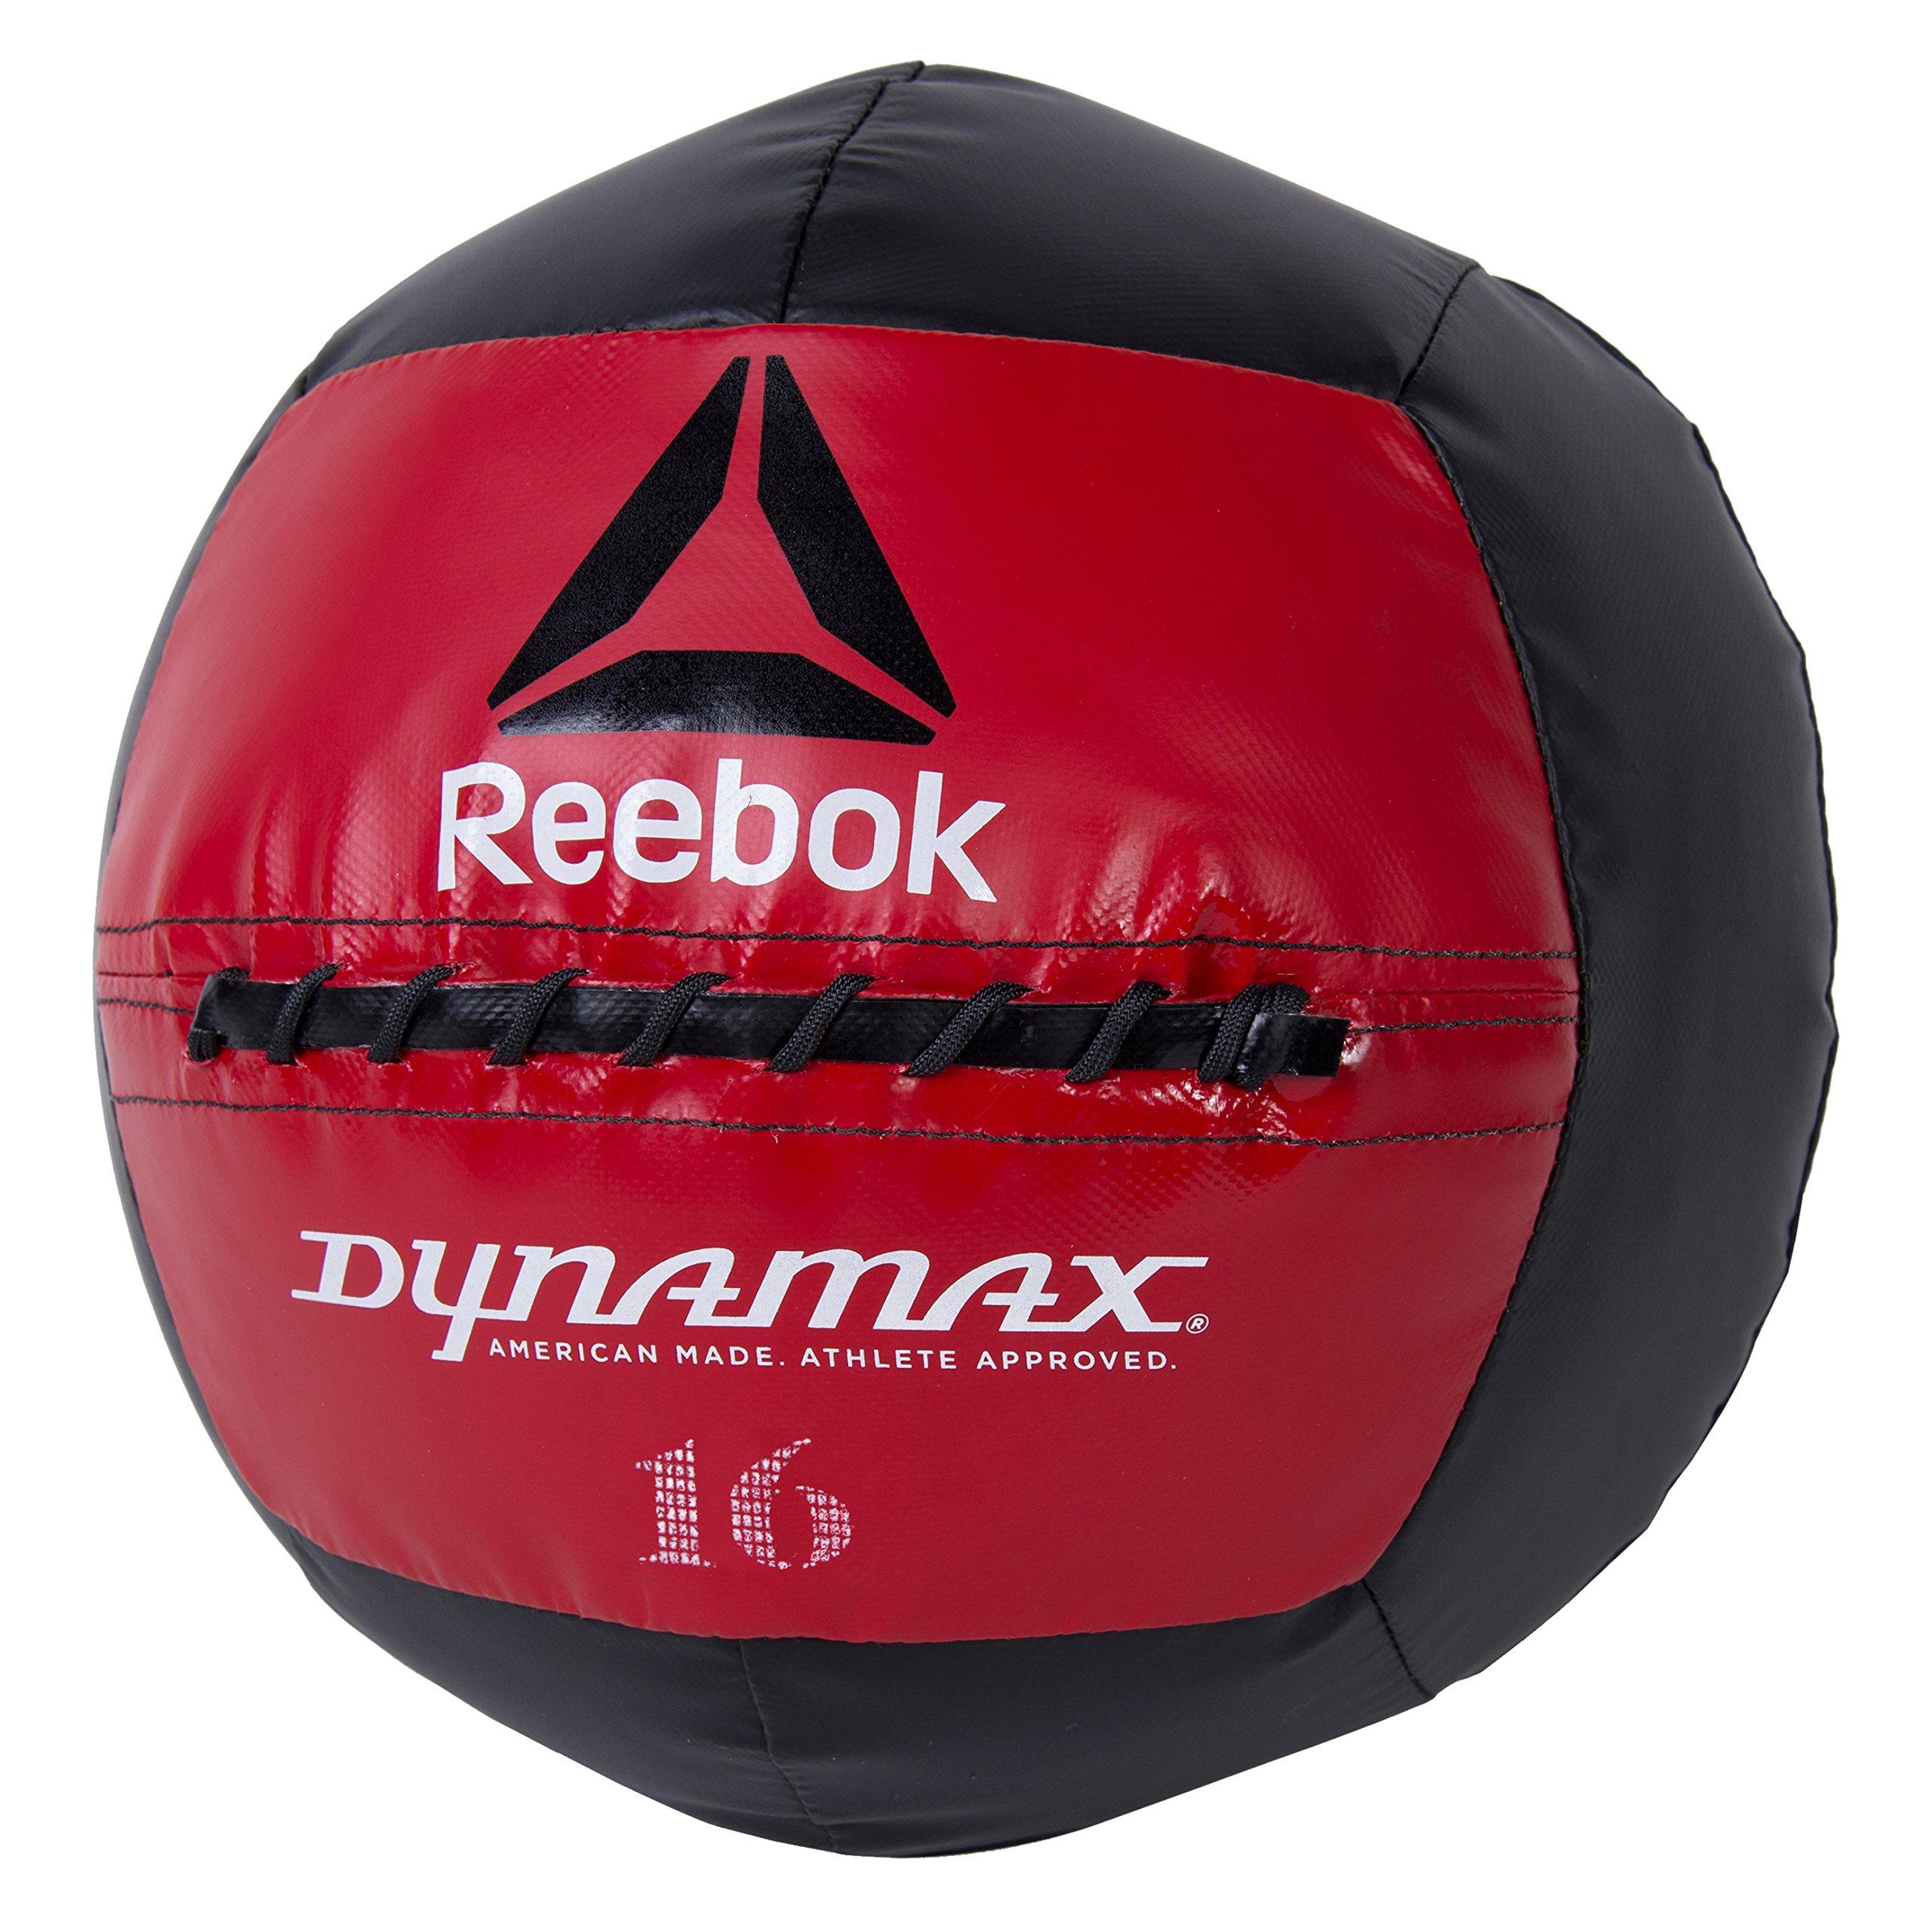 Reebok Soft-Shell Medicine Ball by Dynamax, 16 lbs